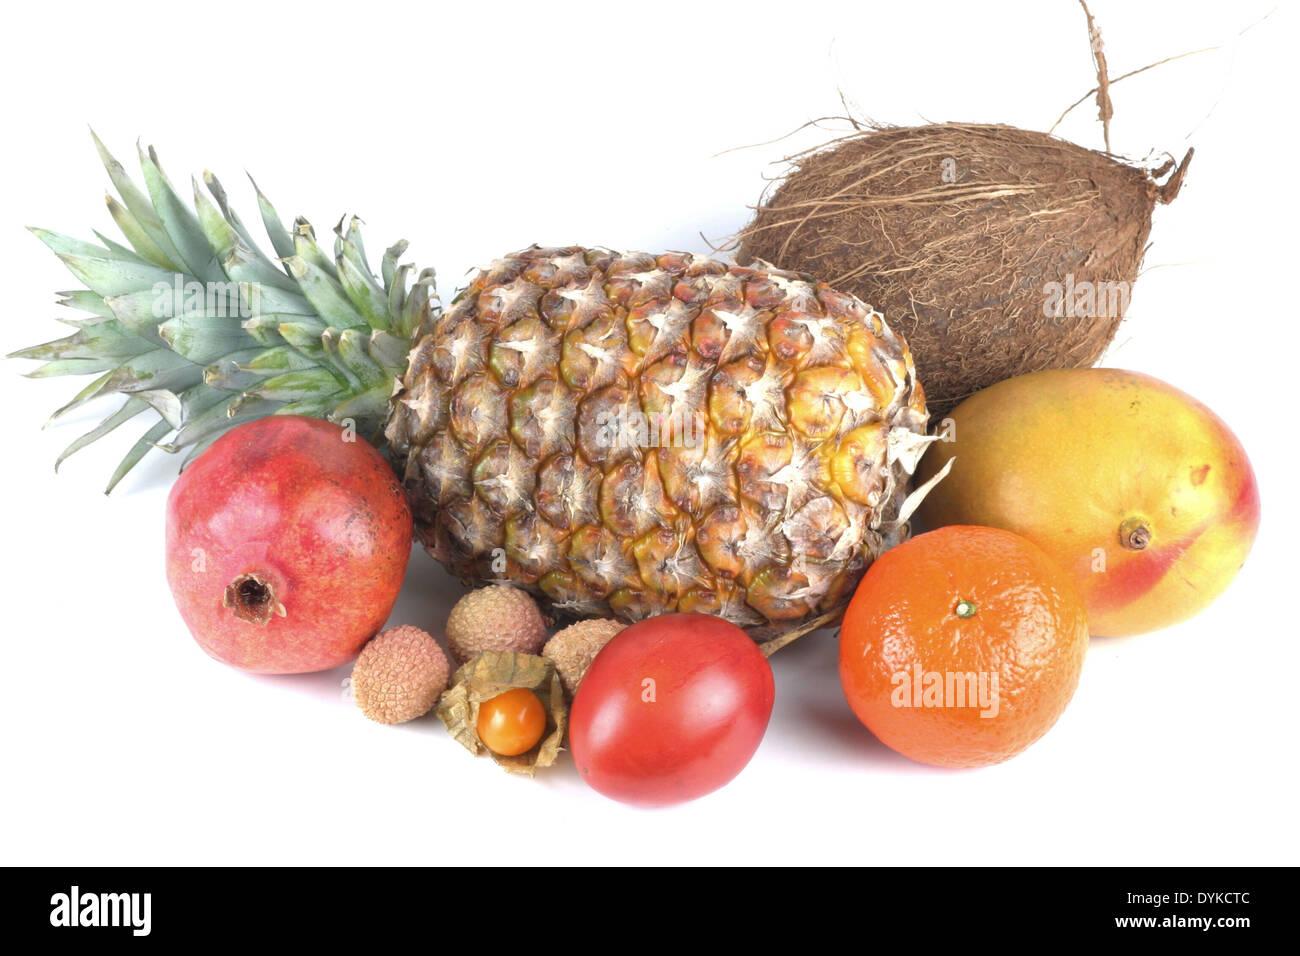 Gemischte exotische tropische Fruechte, Cape gooseberry, pomegranate, anar, tree tomato, lychee, litchi, mango, coconut, pineapp - Stock Image